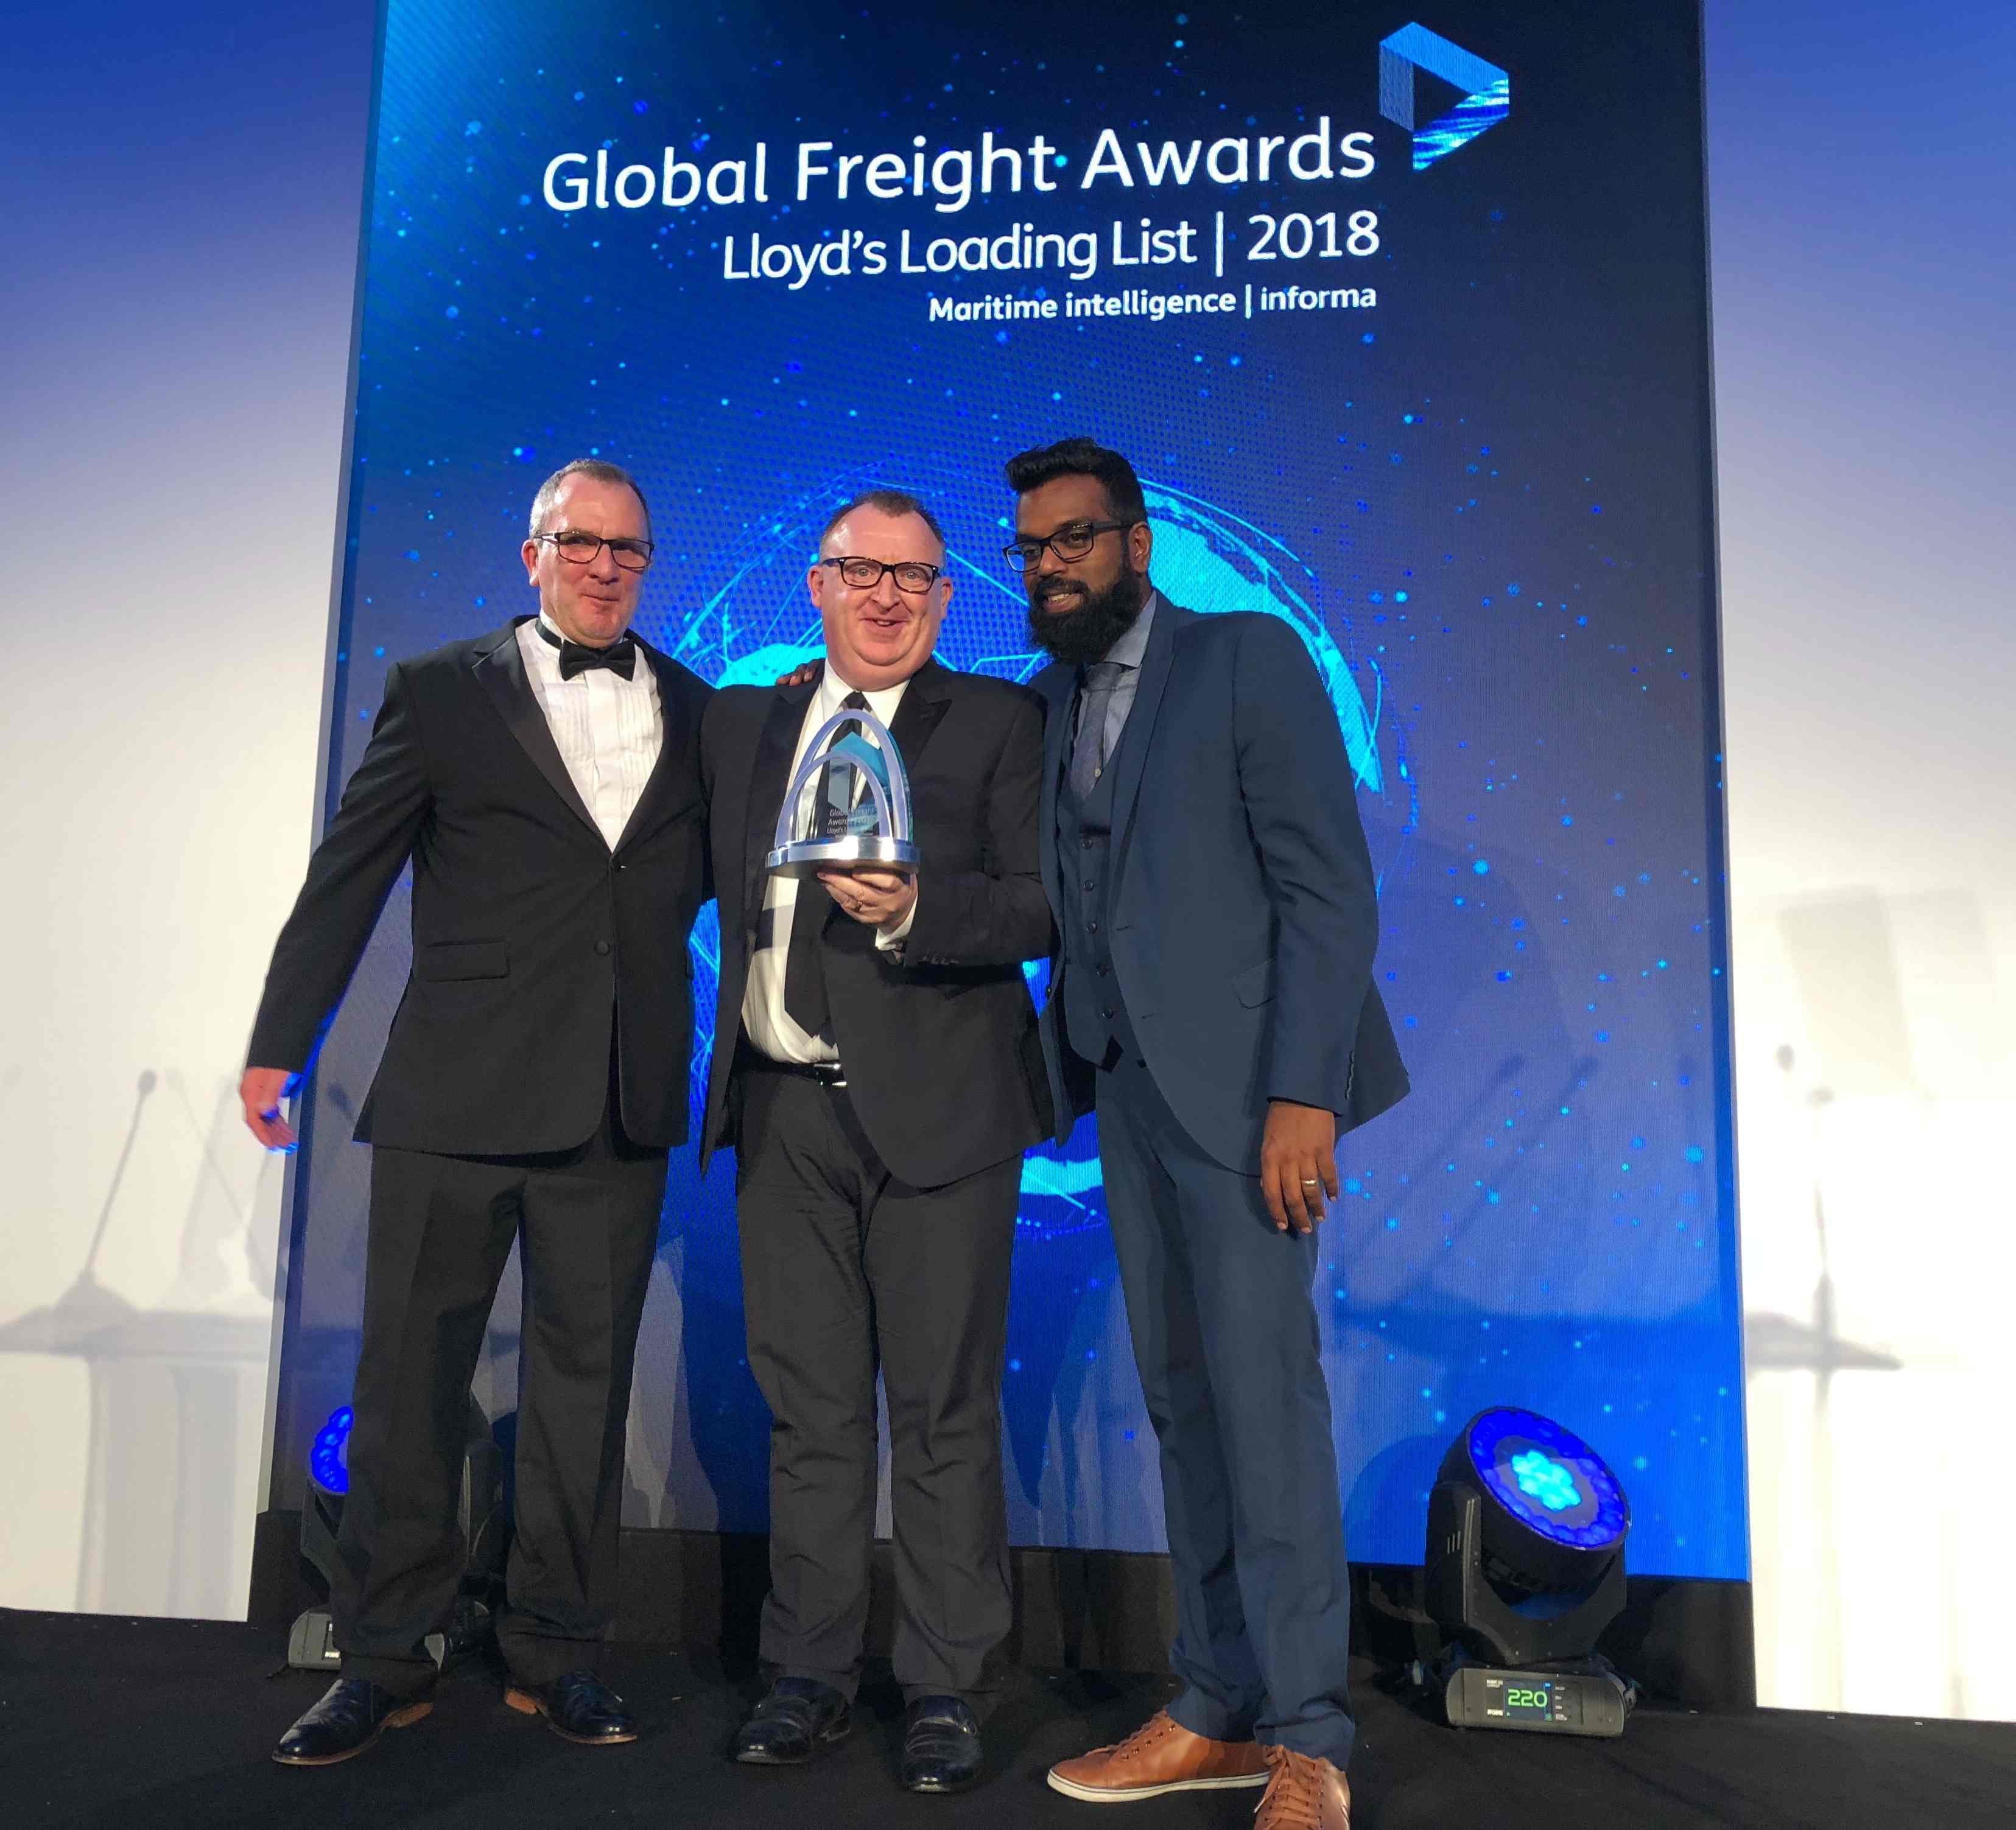 Kerry Logistics Wins Sea Freight Award at Global Freight